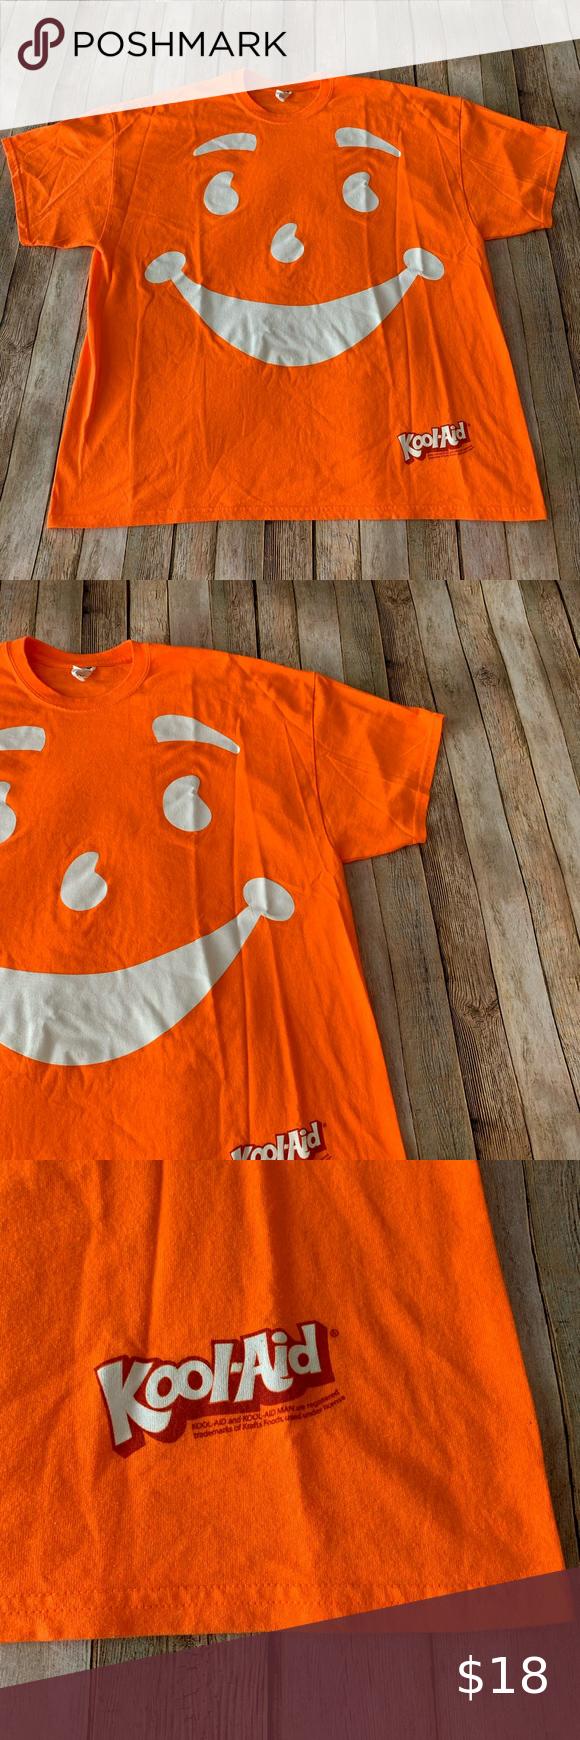 Kool Aid Graphic Tee Shirt Size Xxl Graphic Tee Shirts Tee Shirts Shirt Size